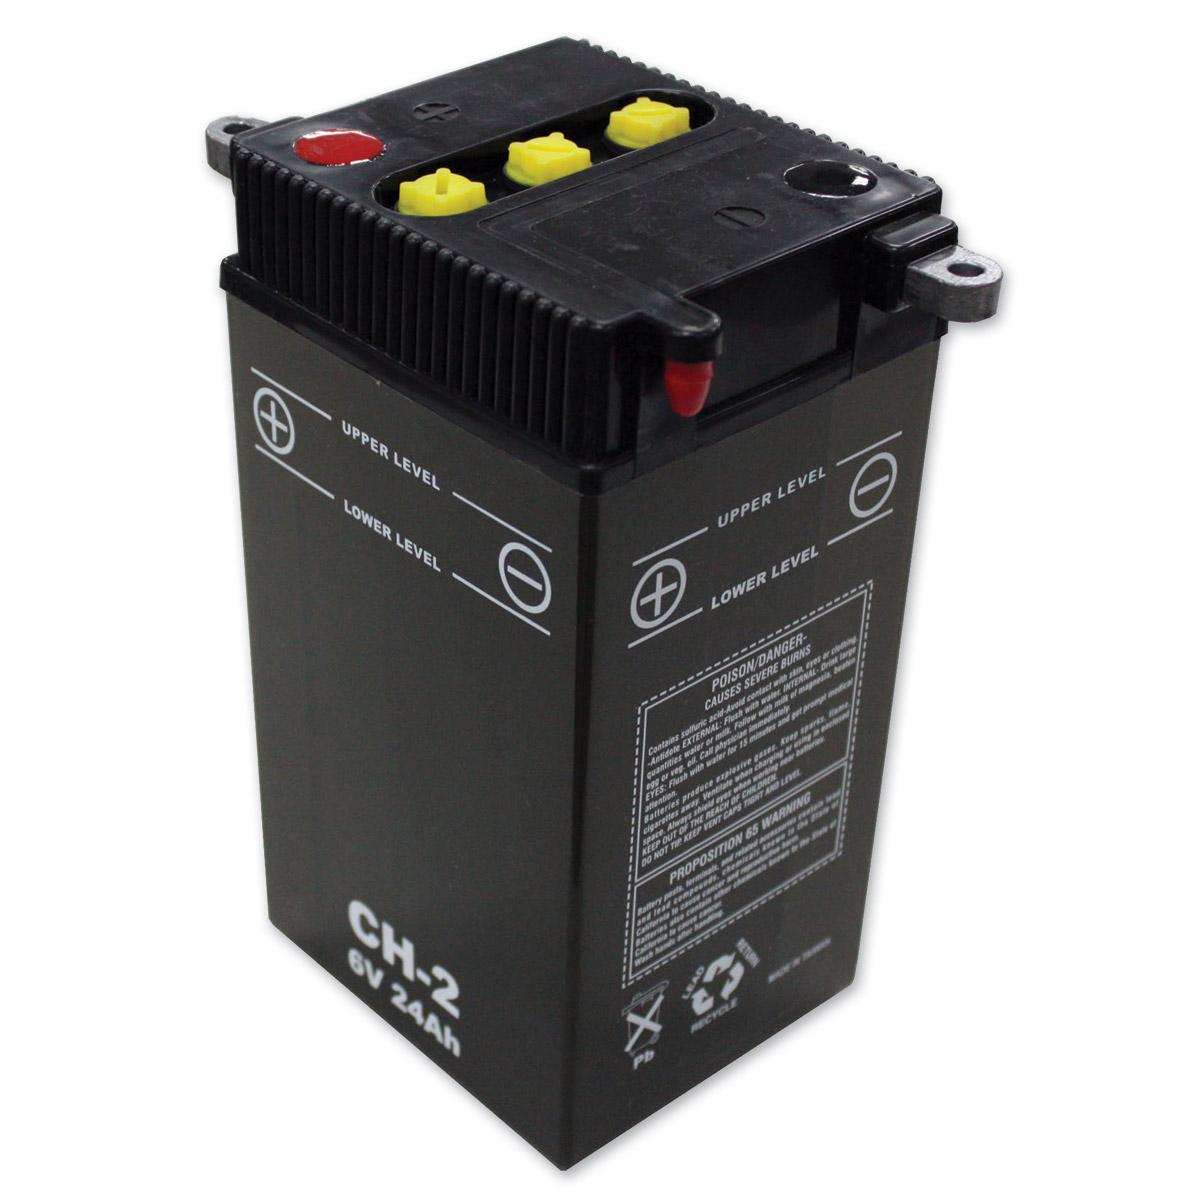 Harley Davidson Battery Price